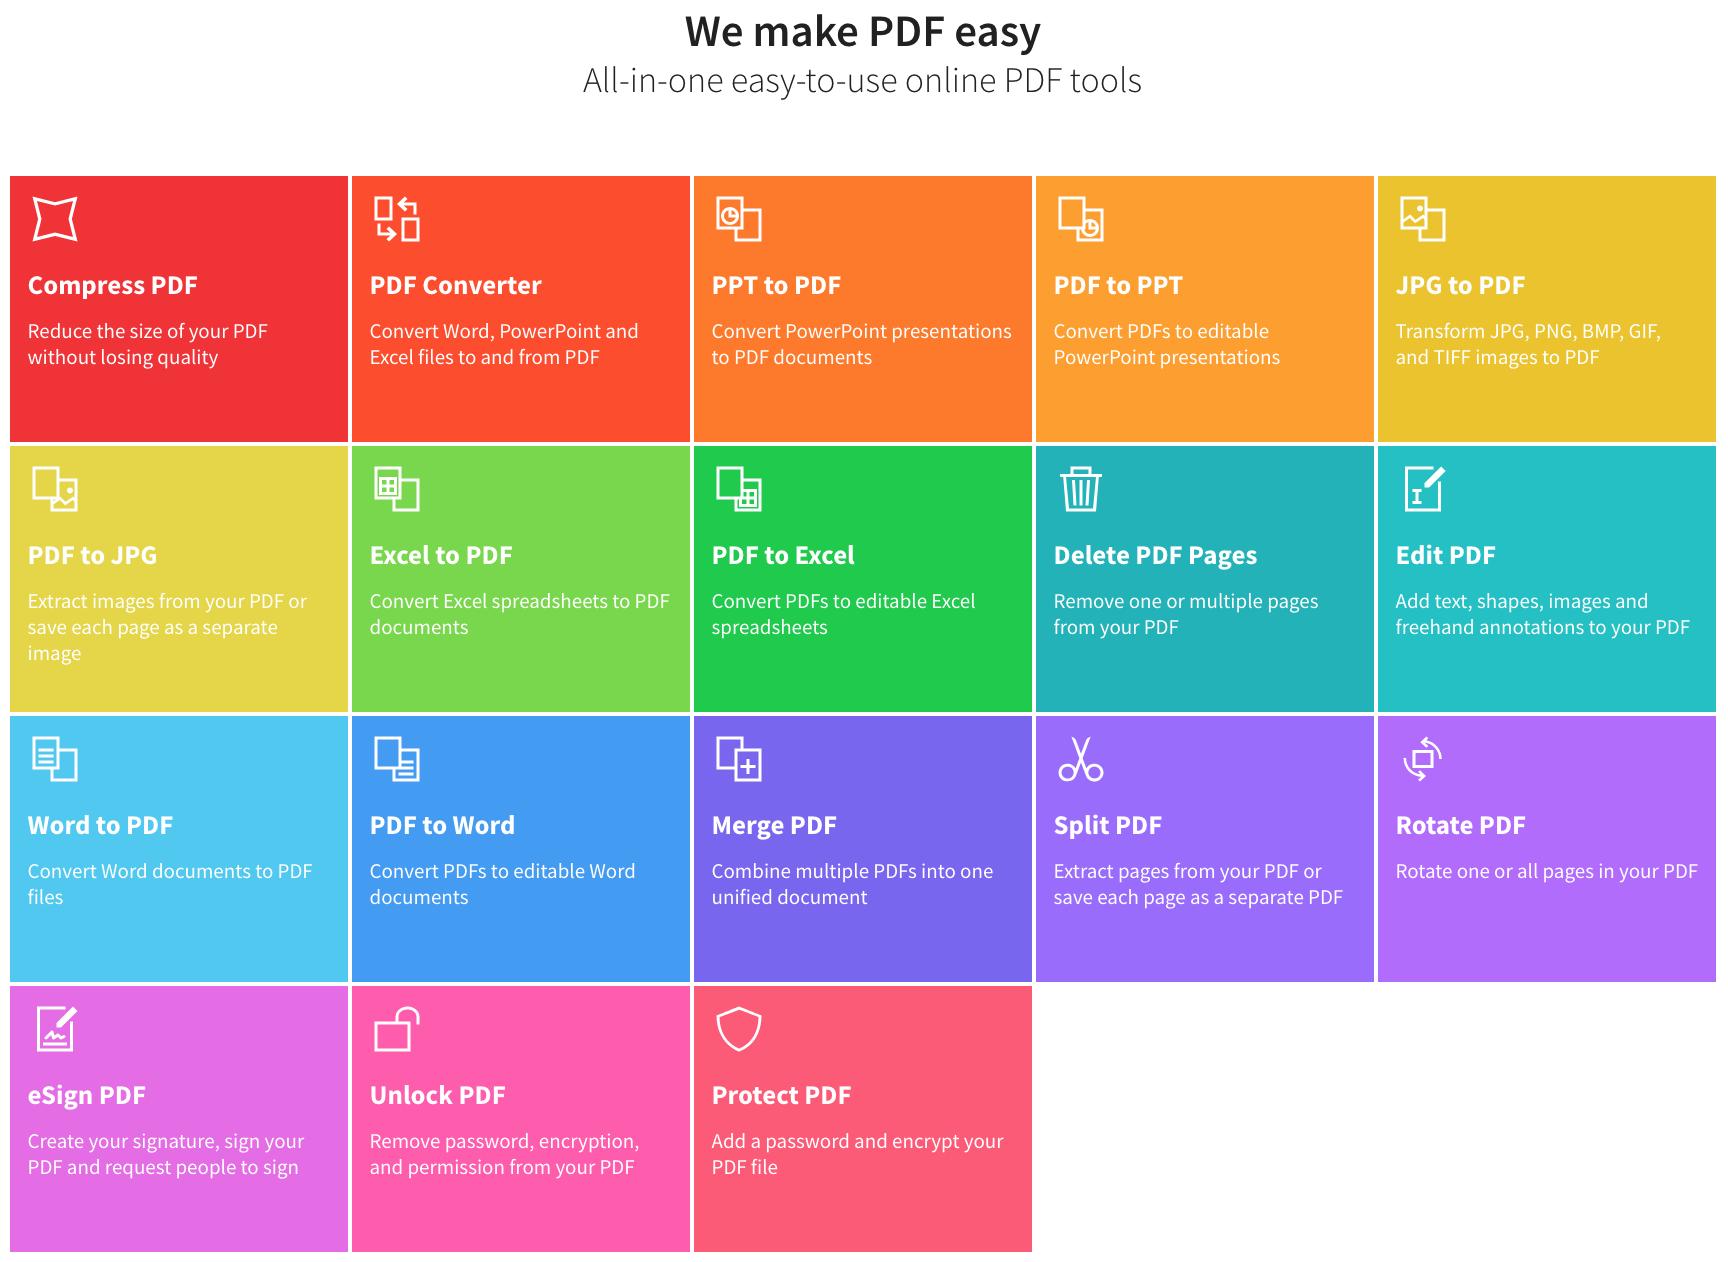 Free Online JPG to PPT Converter